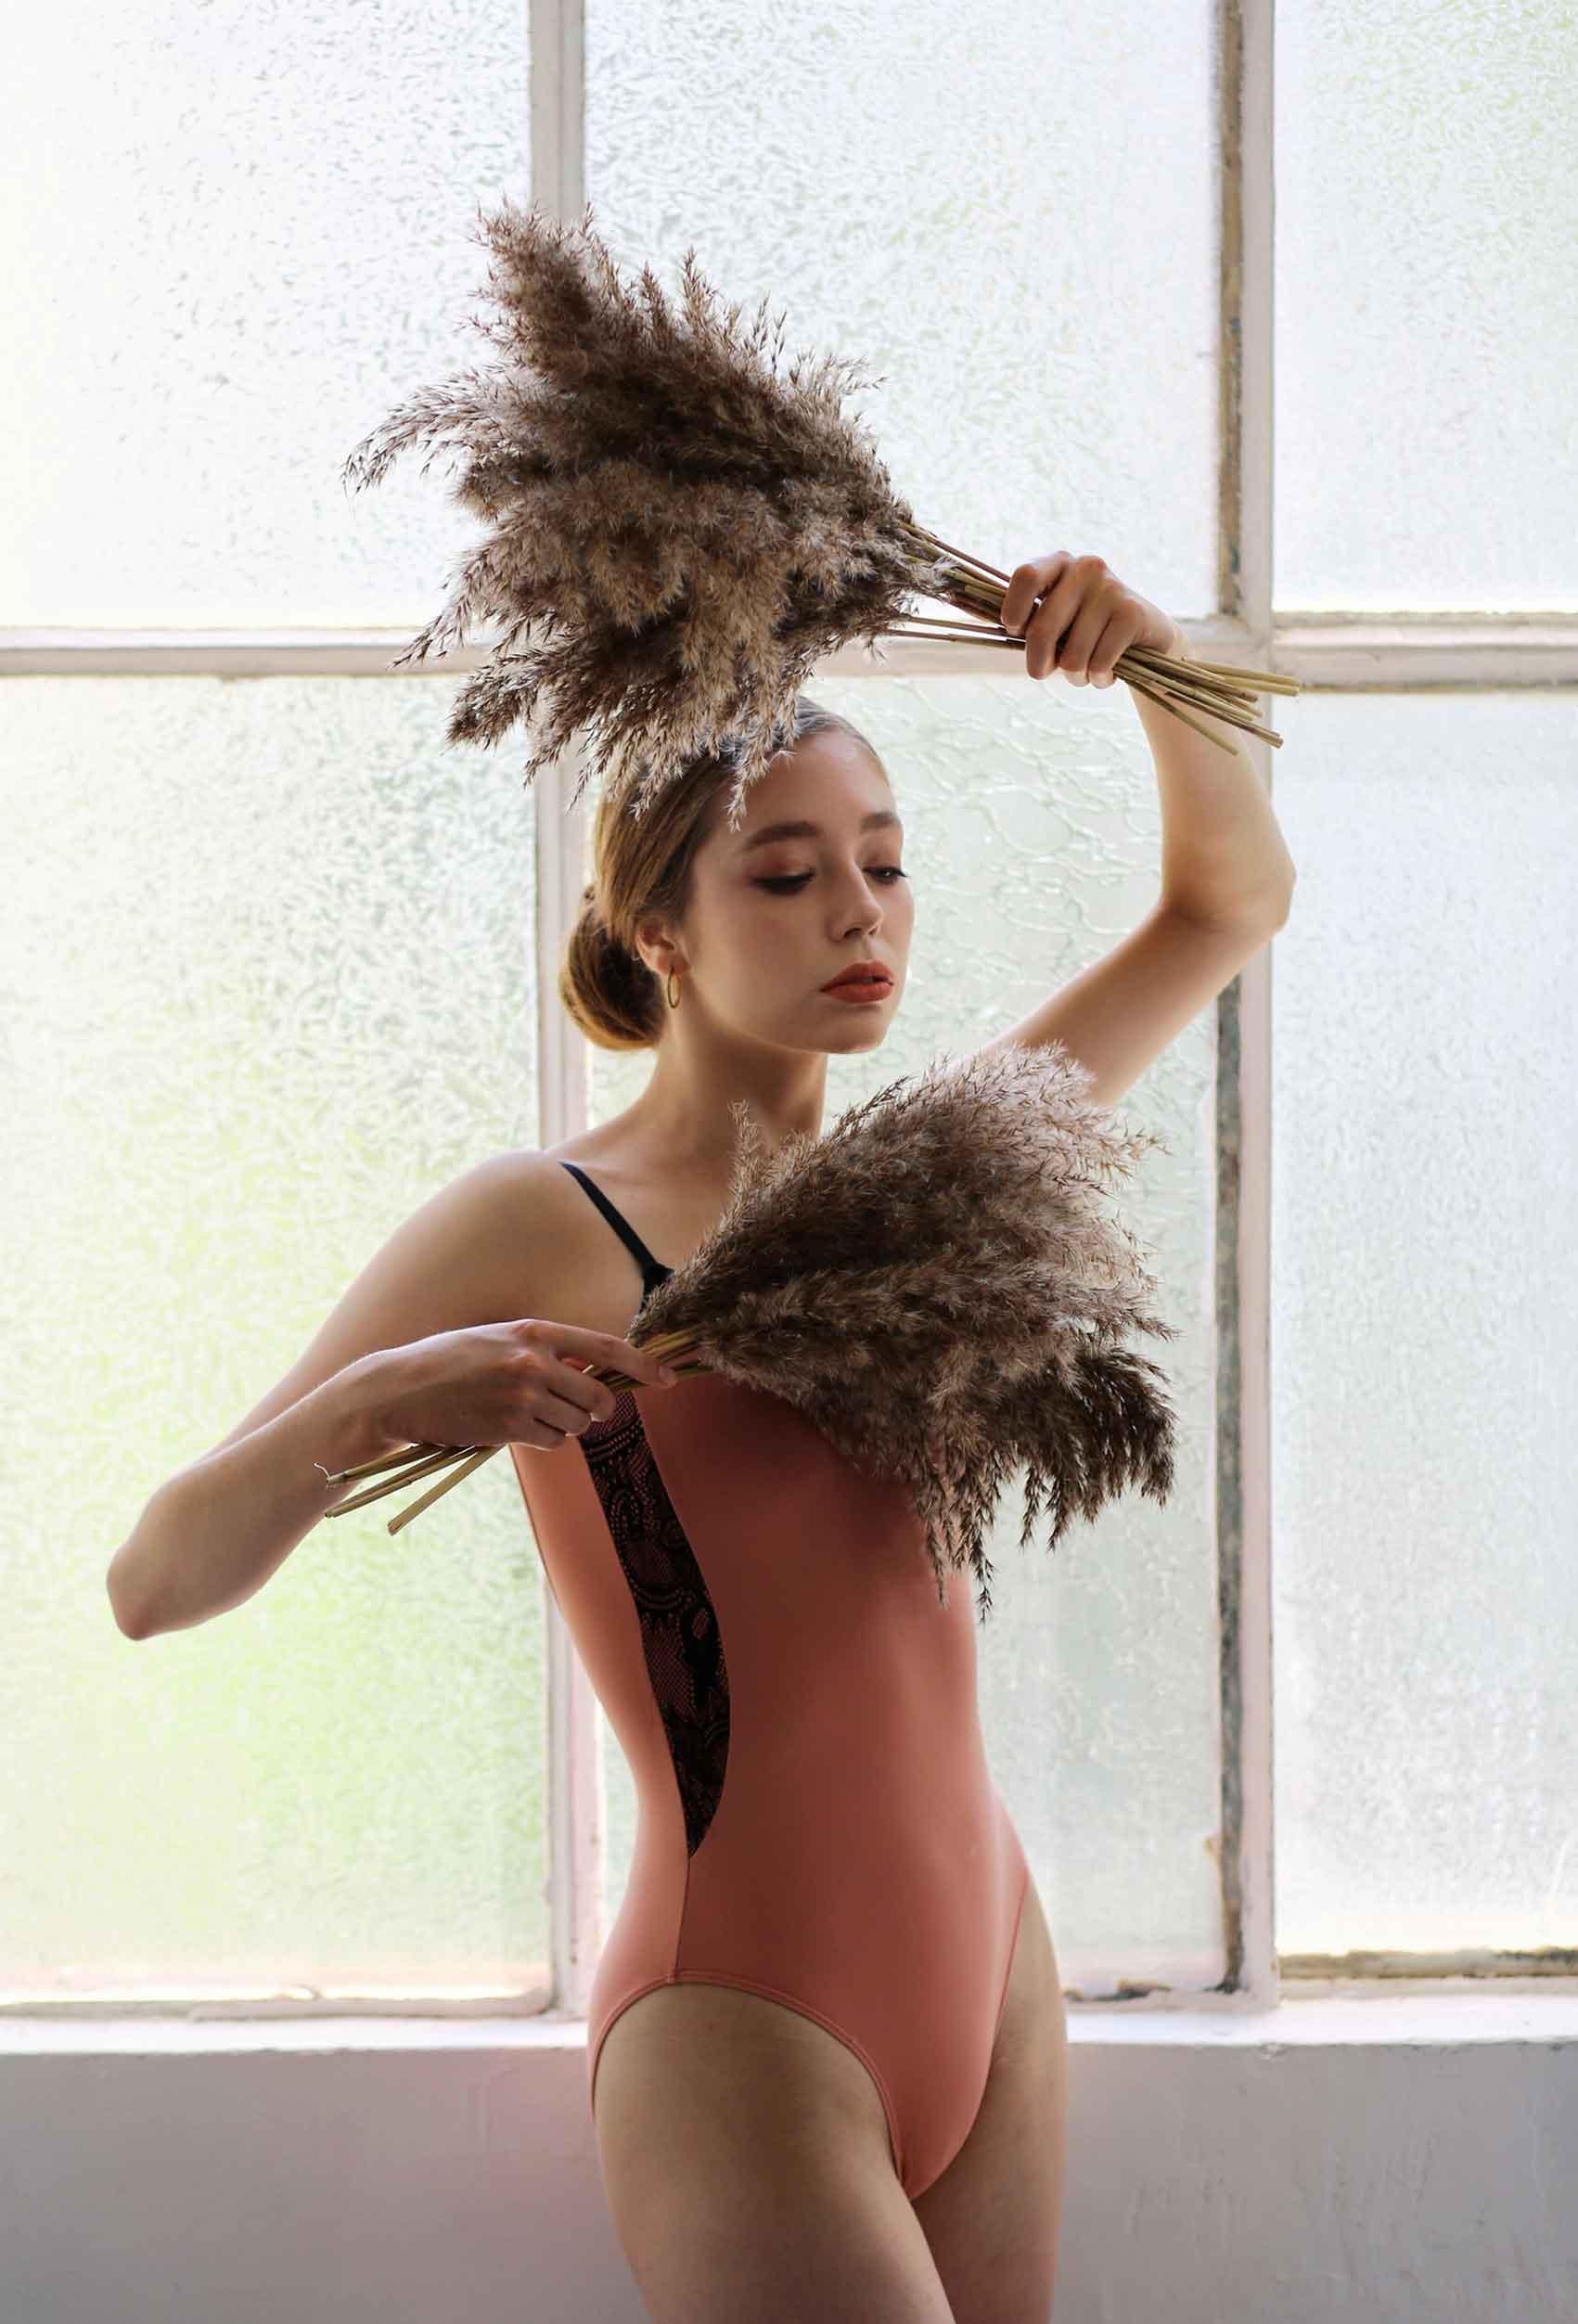 Beaut, Photography, Elinor Harari, Model, Alisa Korkhin, Hair, Makeup, Jane Mogilevsky - איפוראופנה